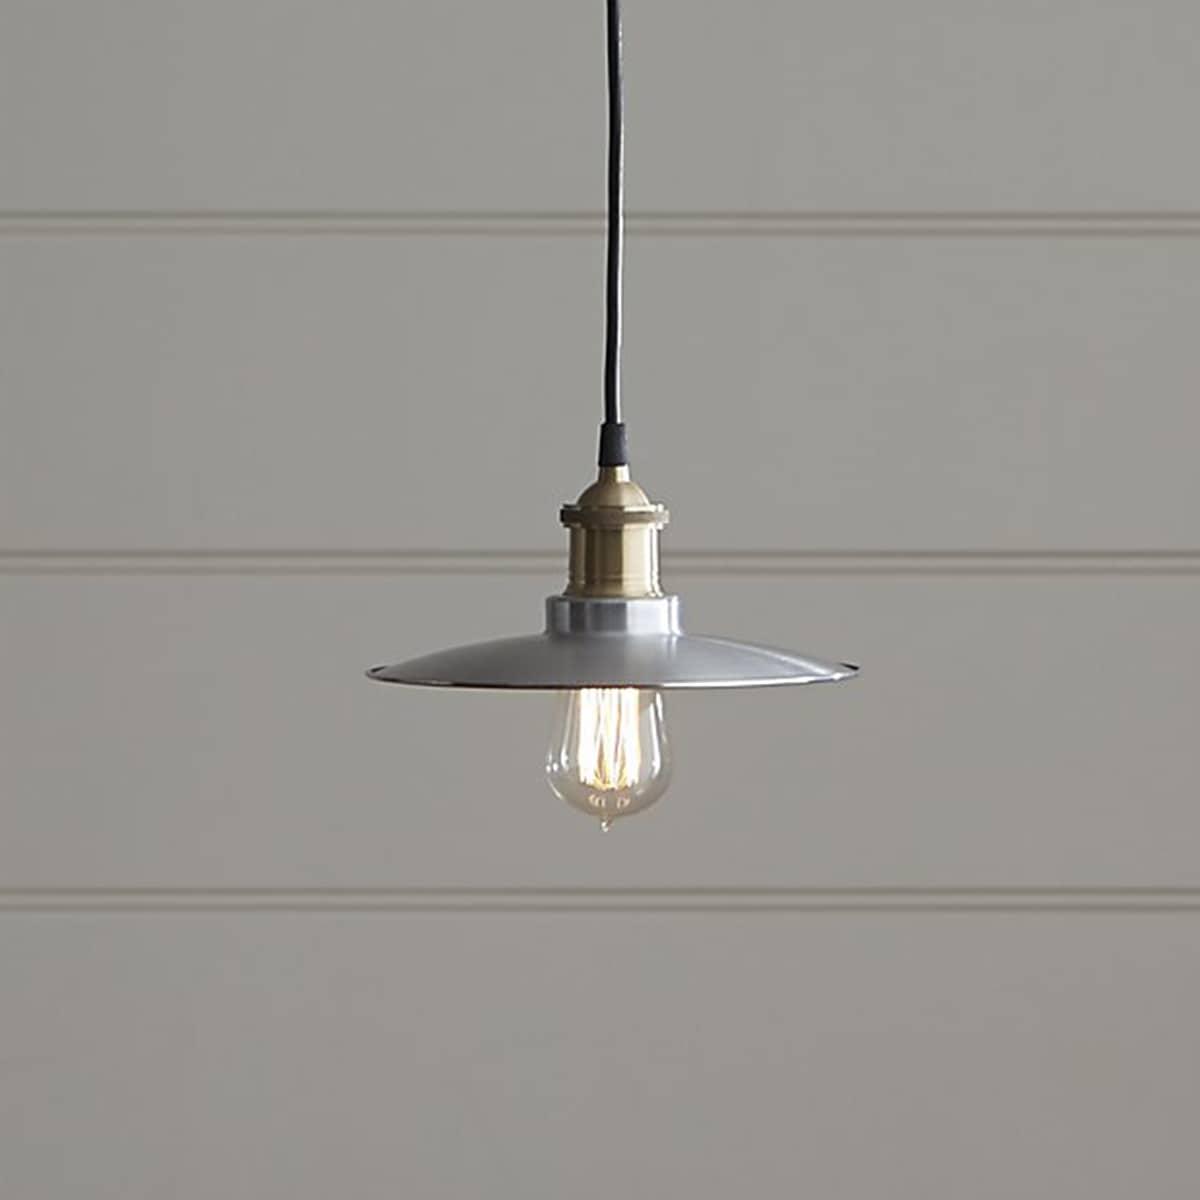 10 Budget-Friendly Kitchen Pendant Lights: gallery image 2